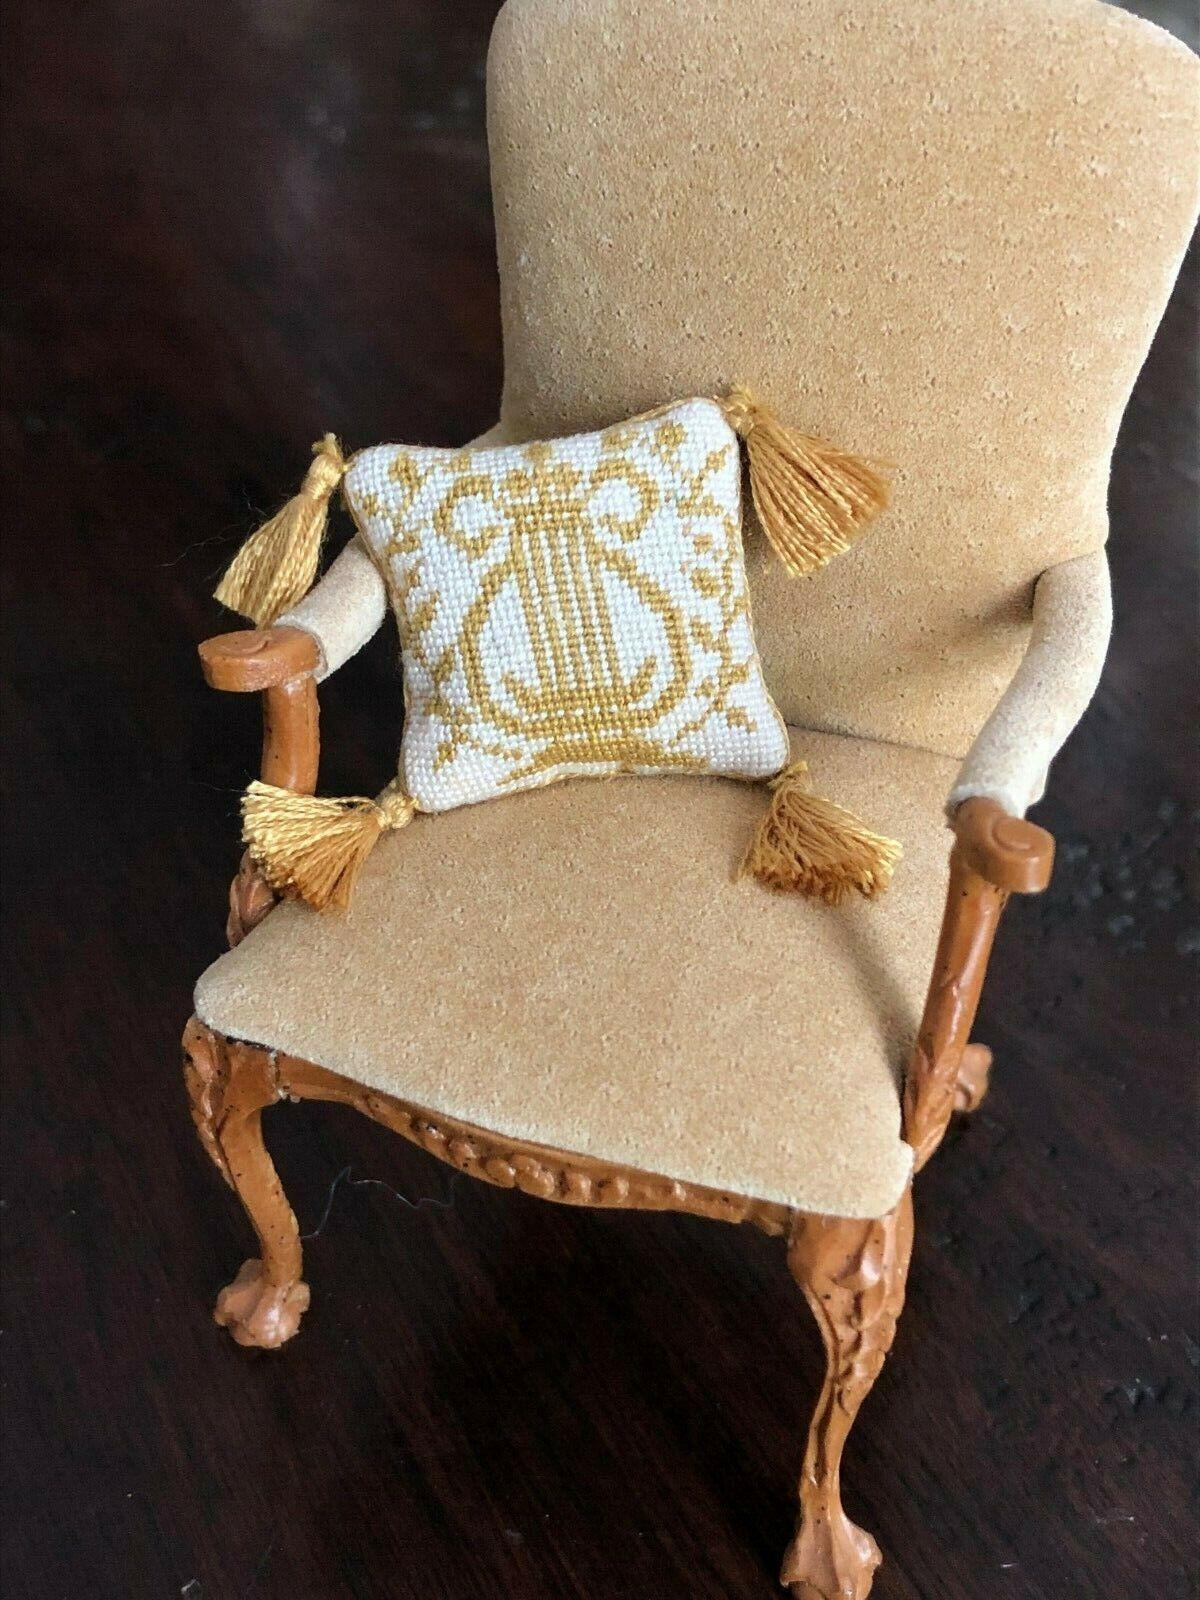 Needlepoint Golden Lyre Cushion Artisan Handmade 1 12th Scale